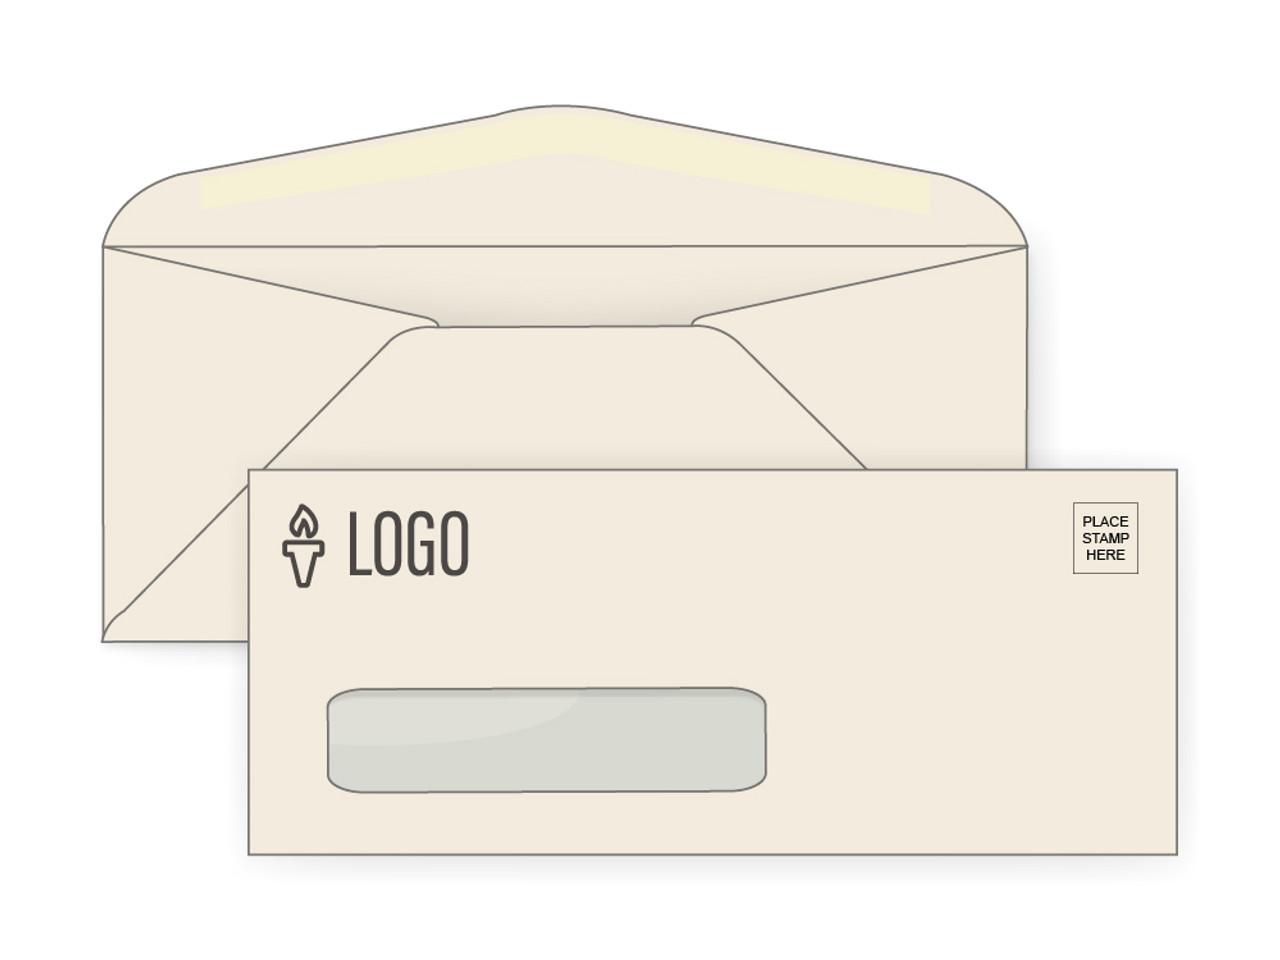 Custom #10 Ivory Window Envelopes - EN1069